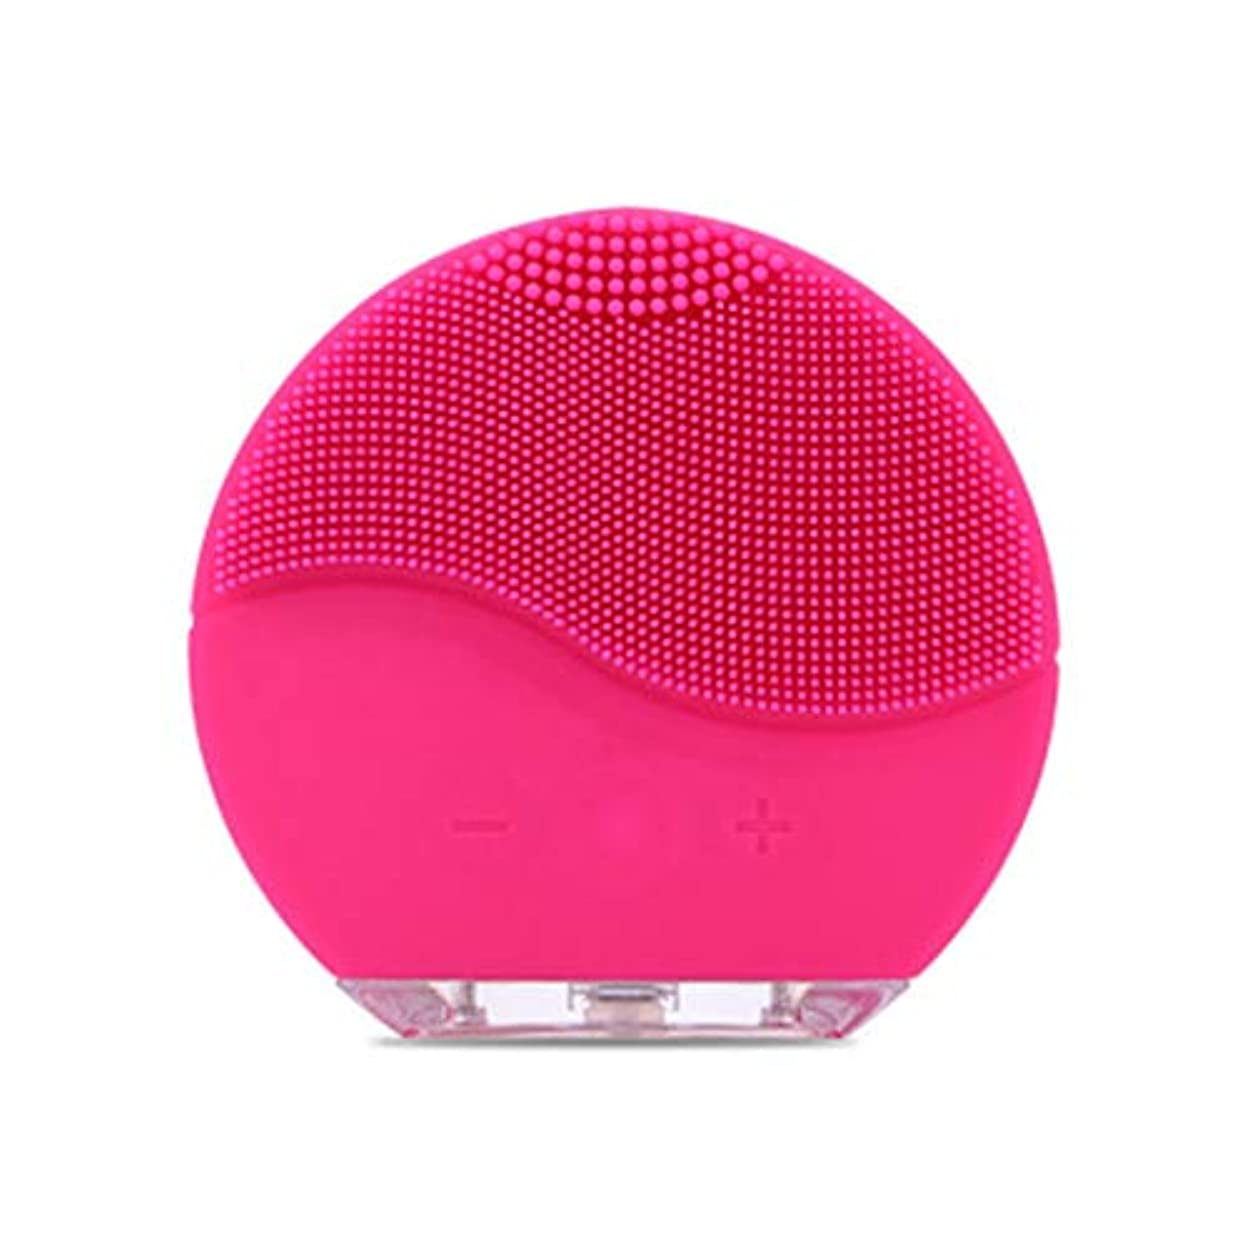 Qi フェイシャルクレンザーブラシ、電気フェイシャルミニシリコン防水超音波ポアクリーンインストゥルメントフェイススキンケアスパマッサージャー GQ (色 : A)